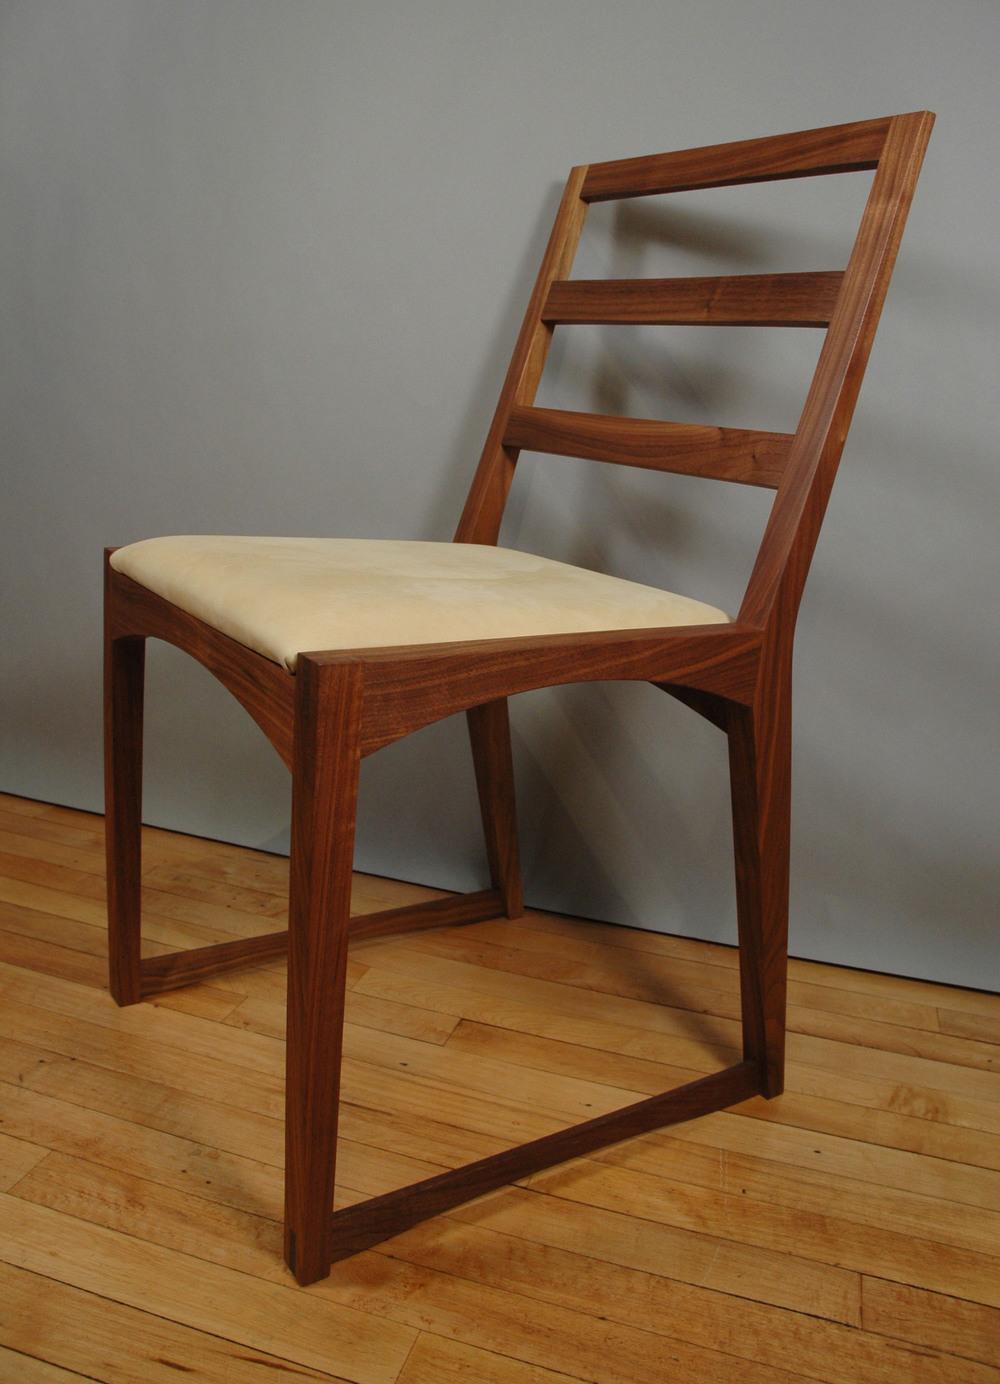 n chair1.jpg